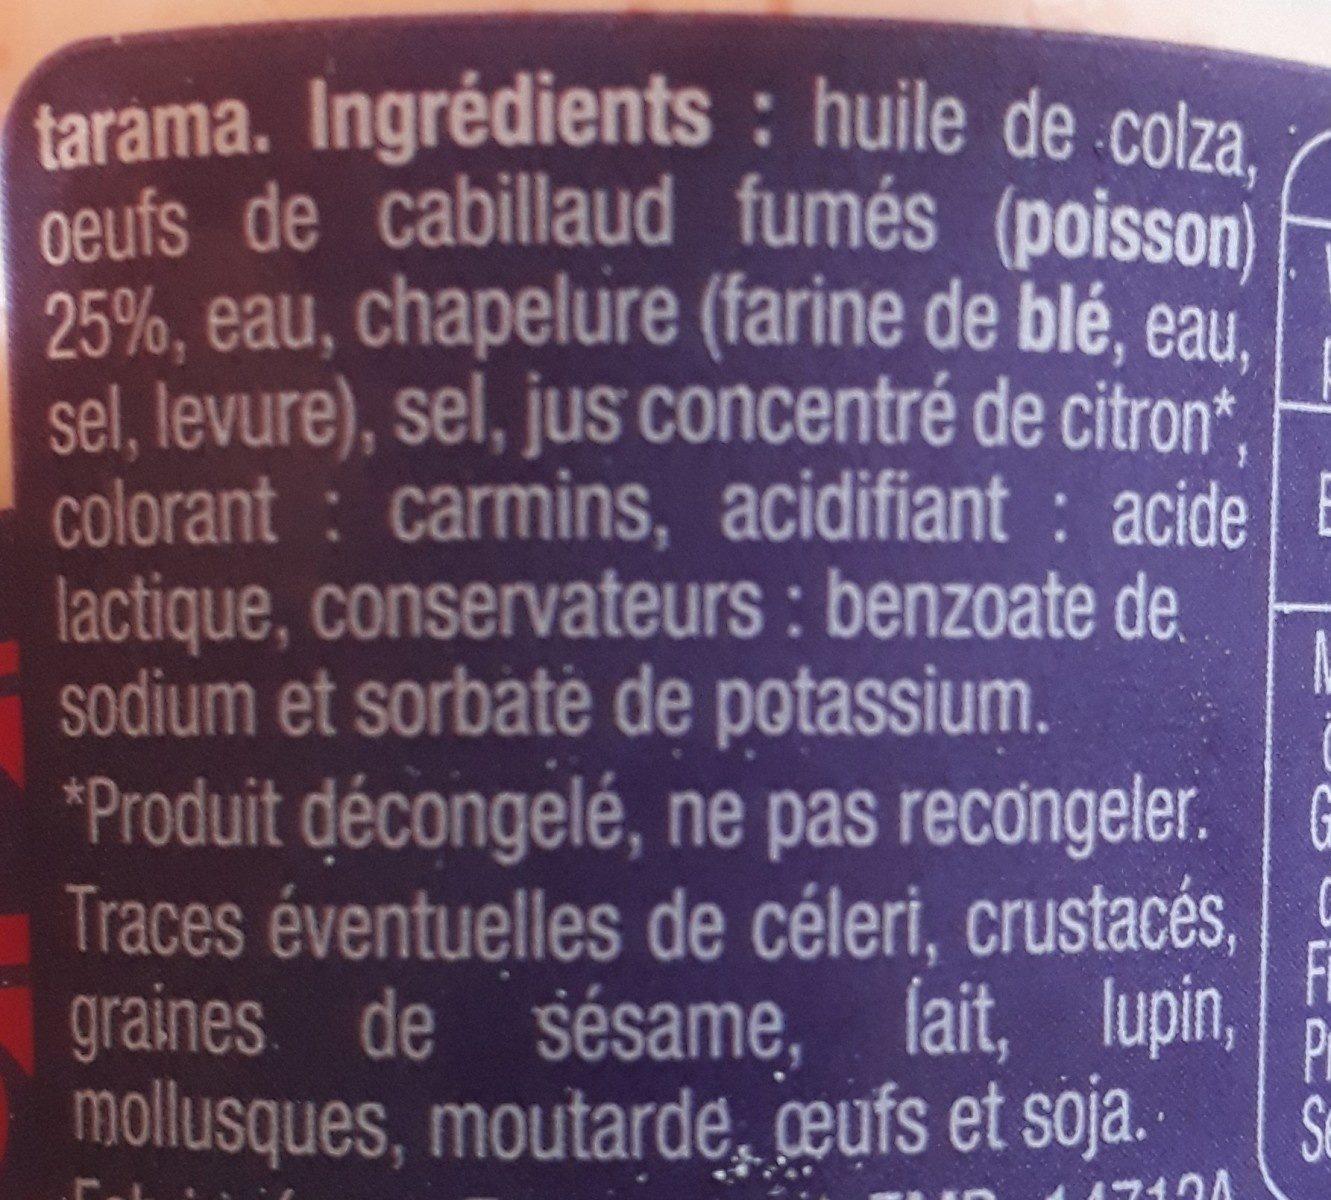 Tarama aux œufs de cabillaud - Ingrédients - fr